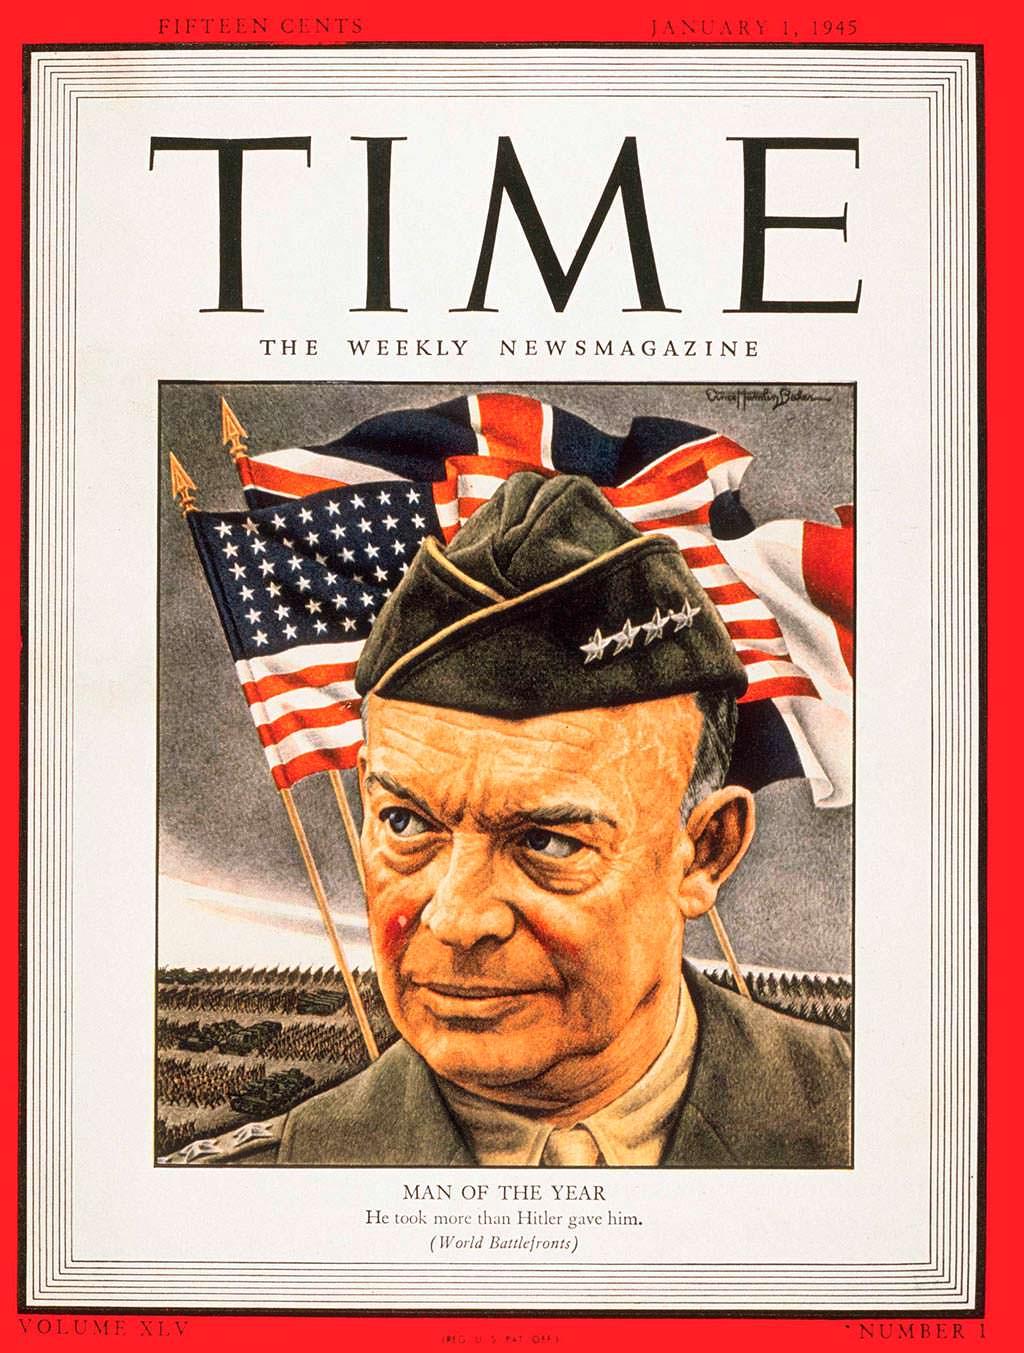 1944 год. Генерал армии США Дуайт Эйзенхауэр на обложке Time